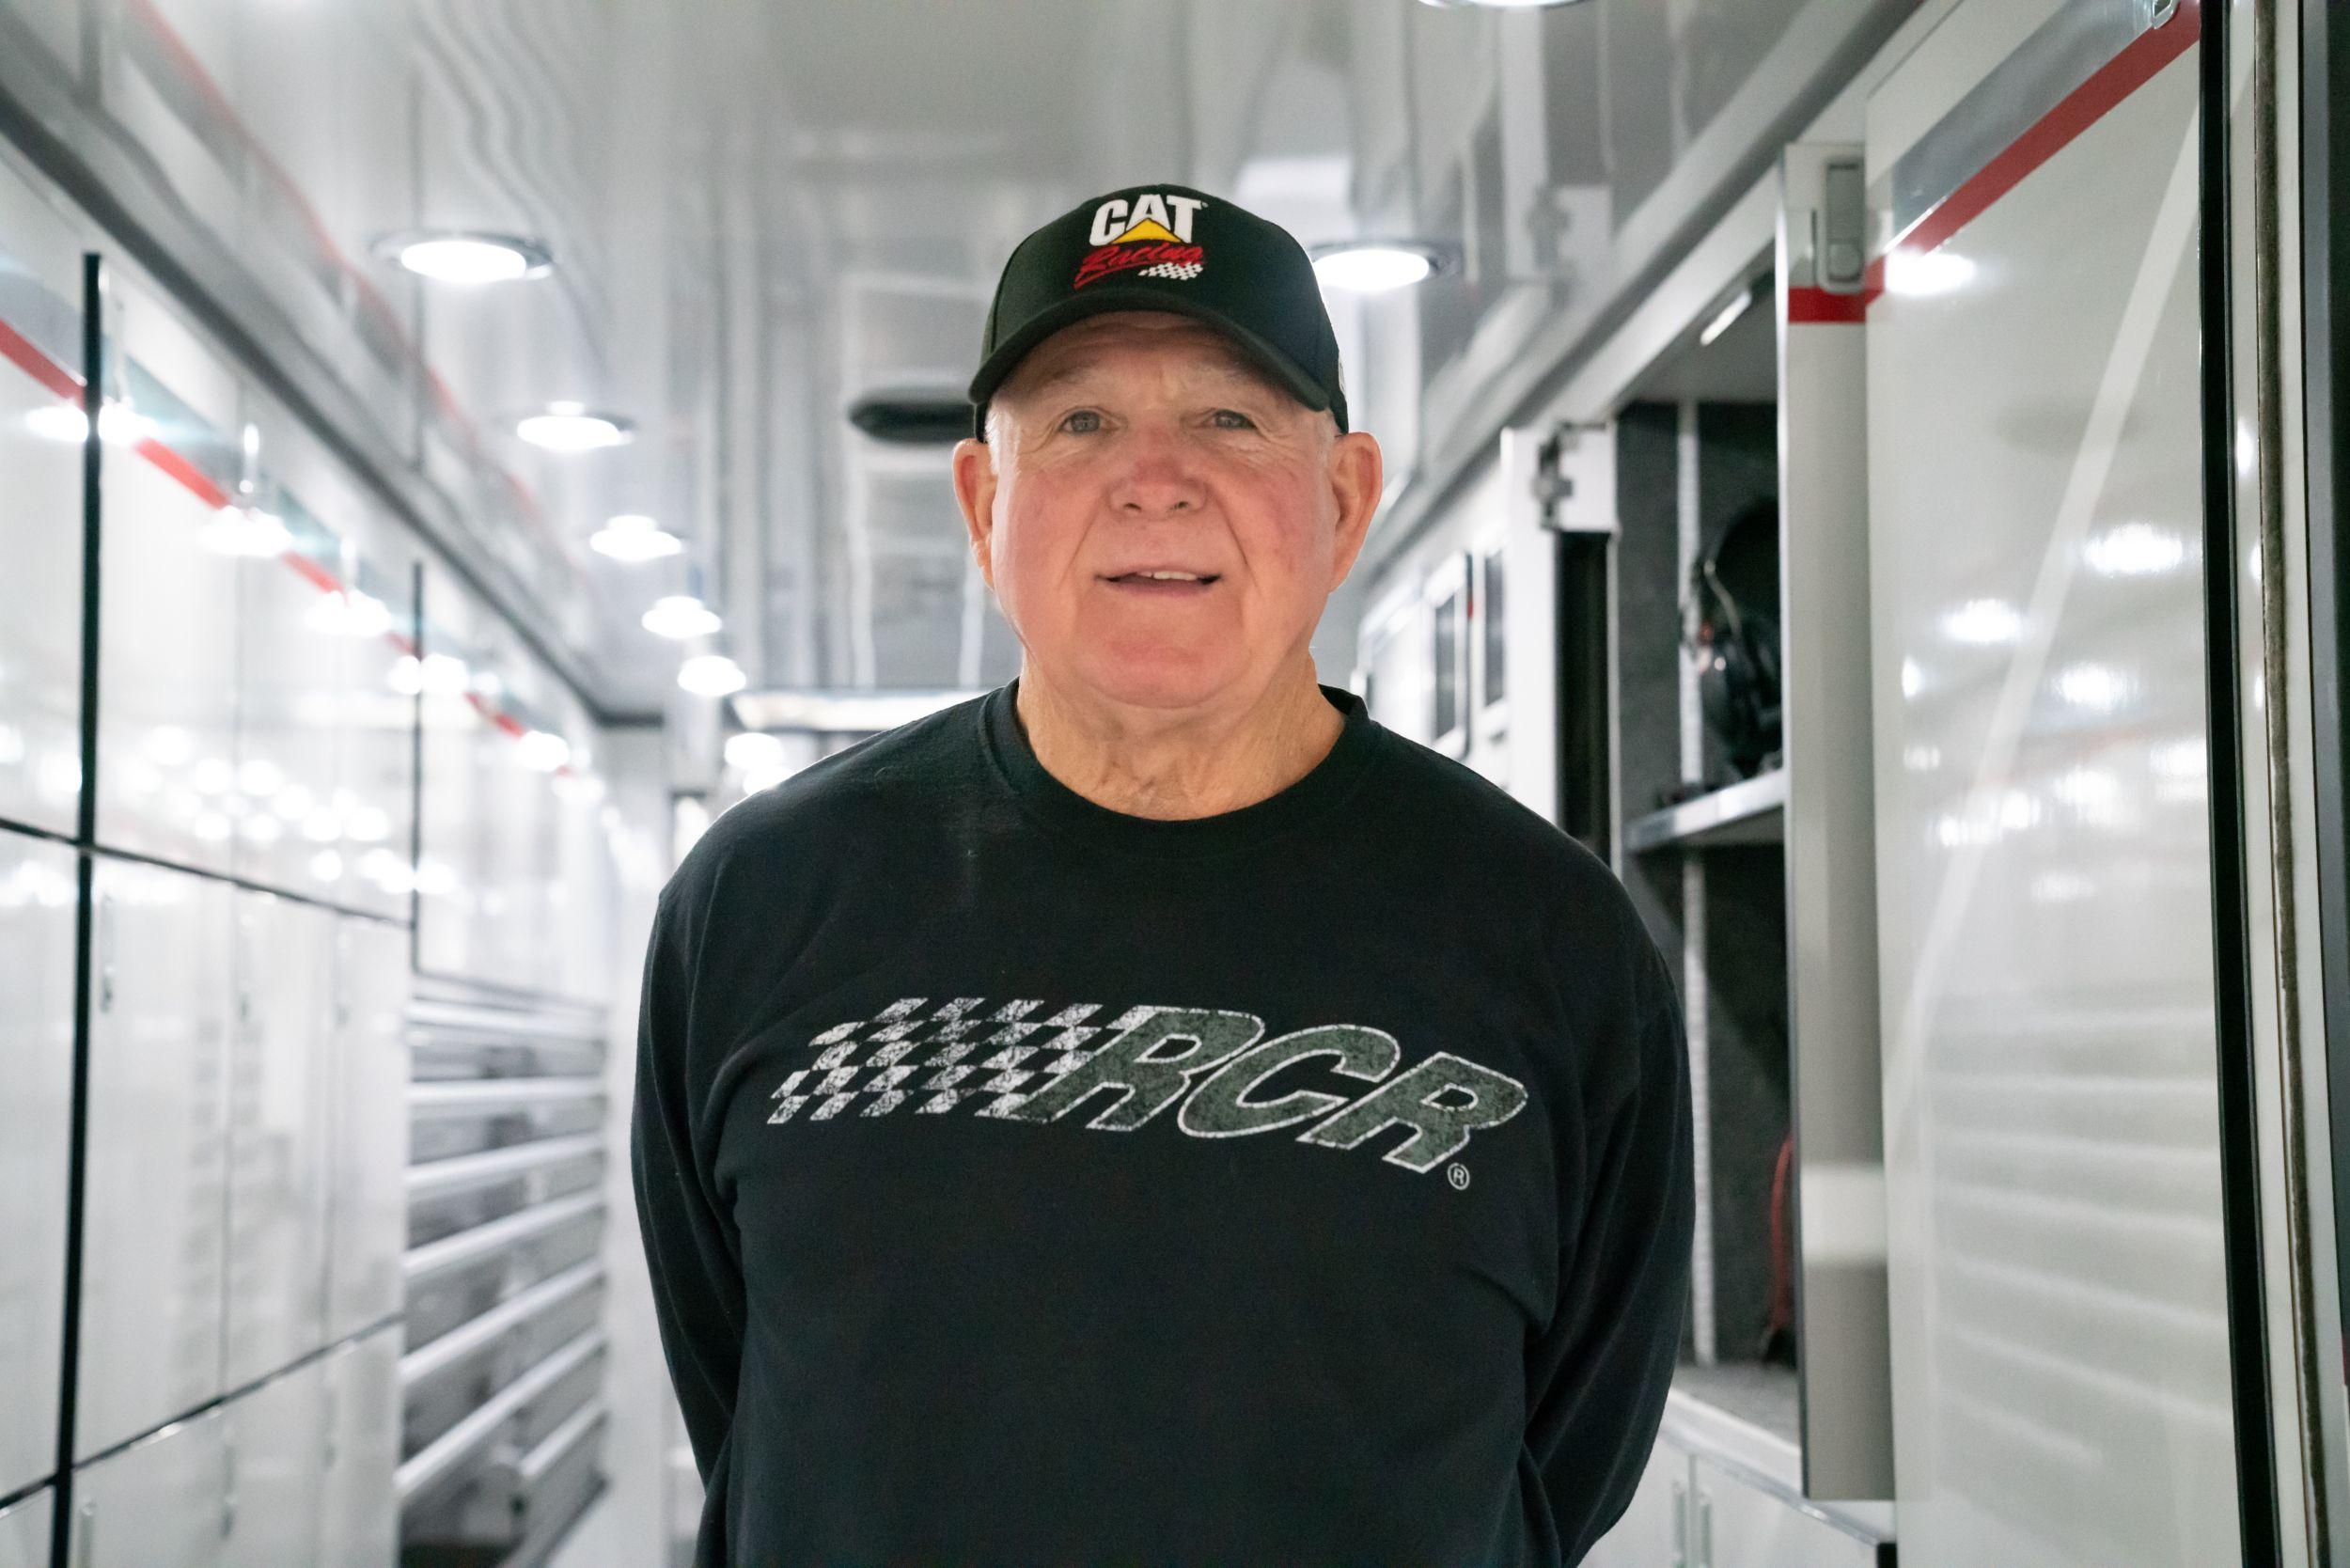 Jerry Tuttle